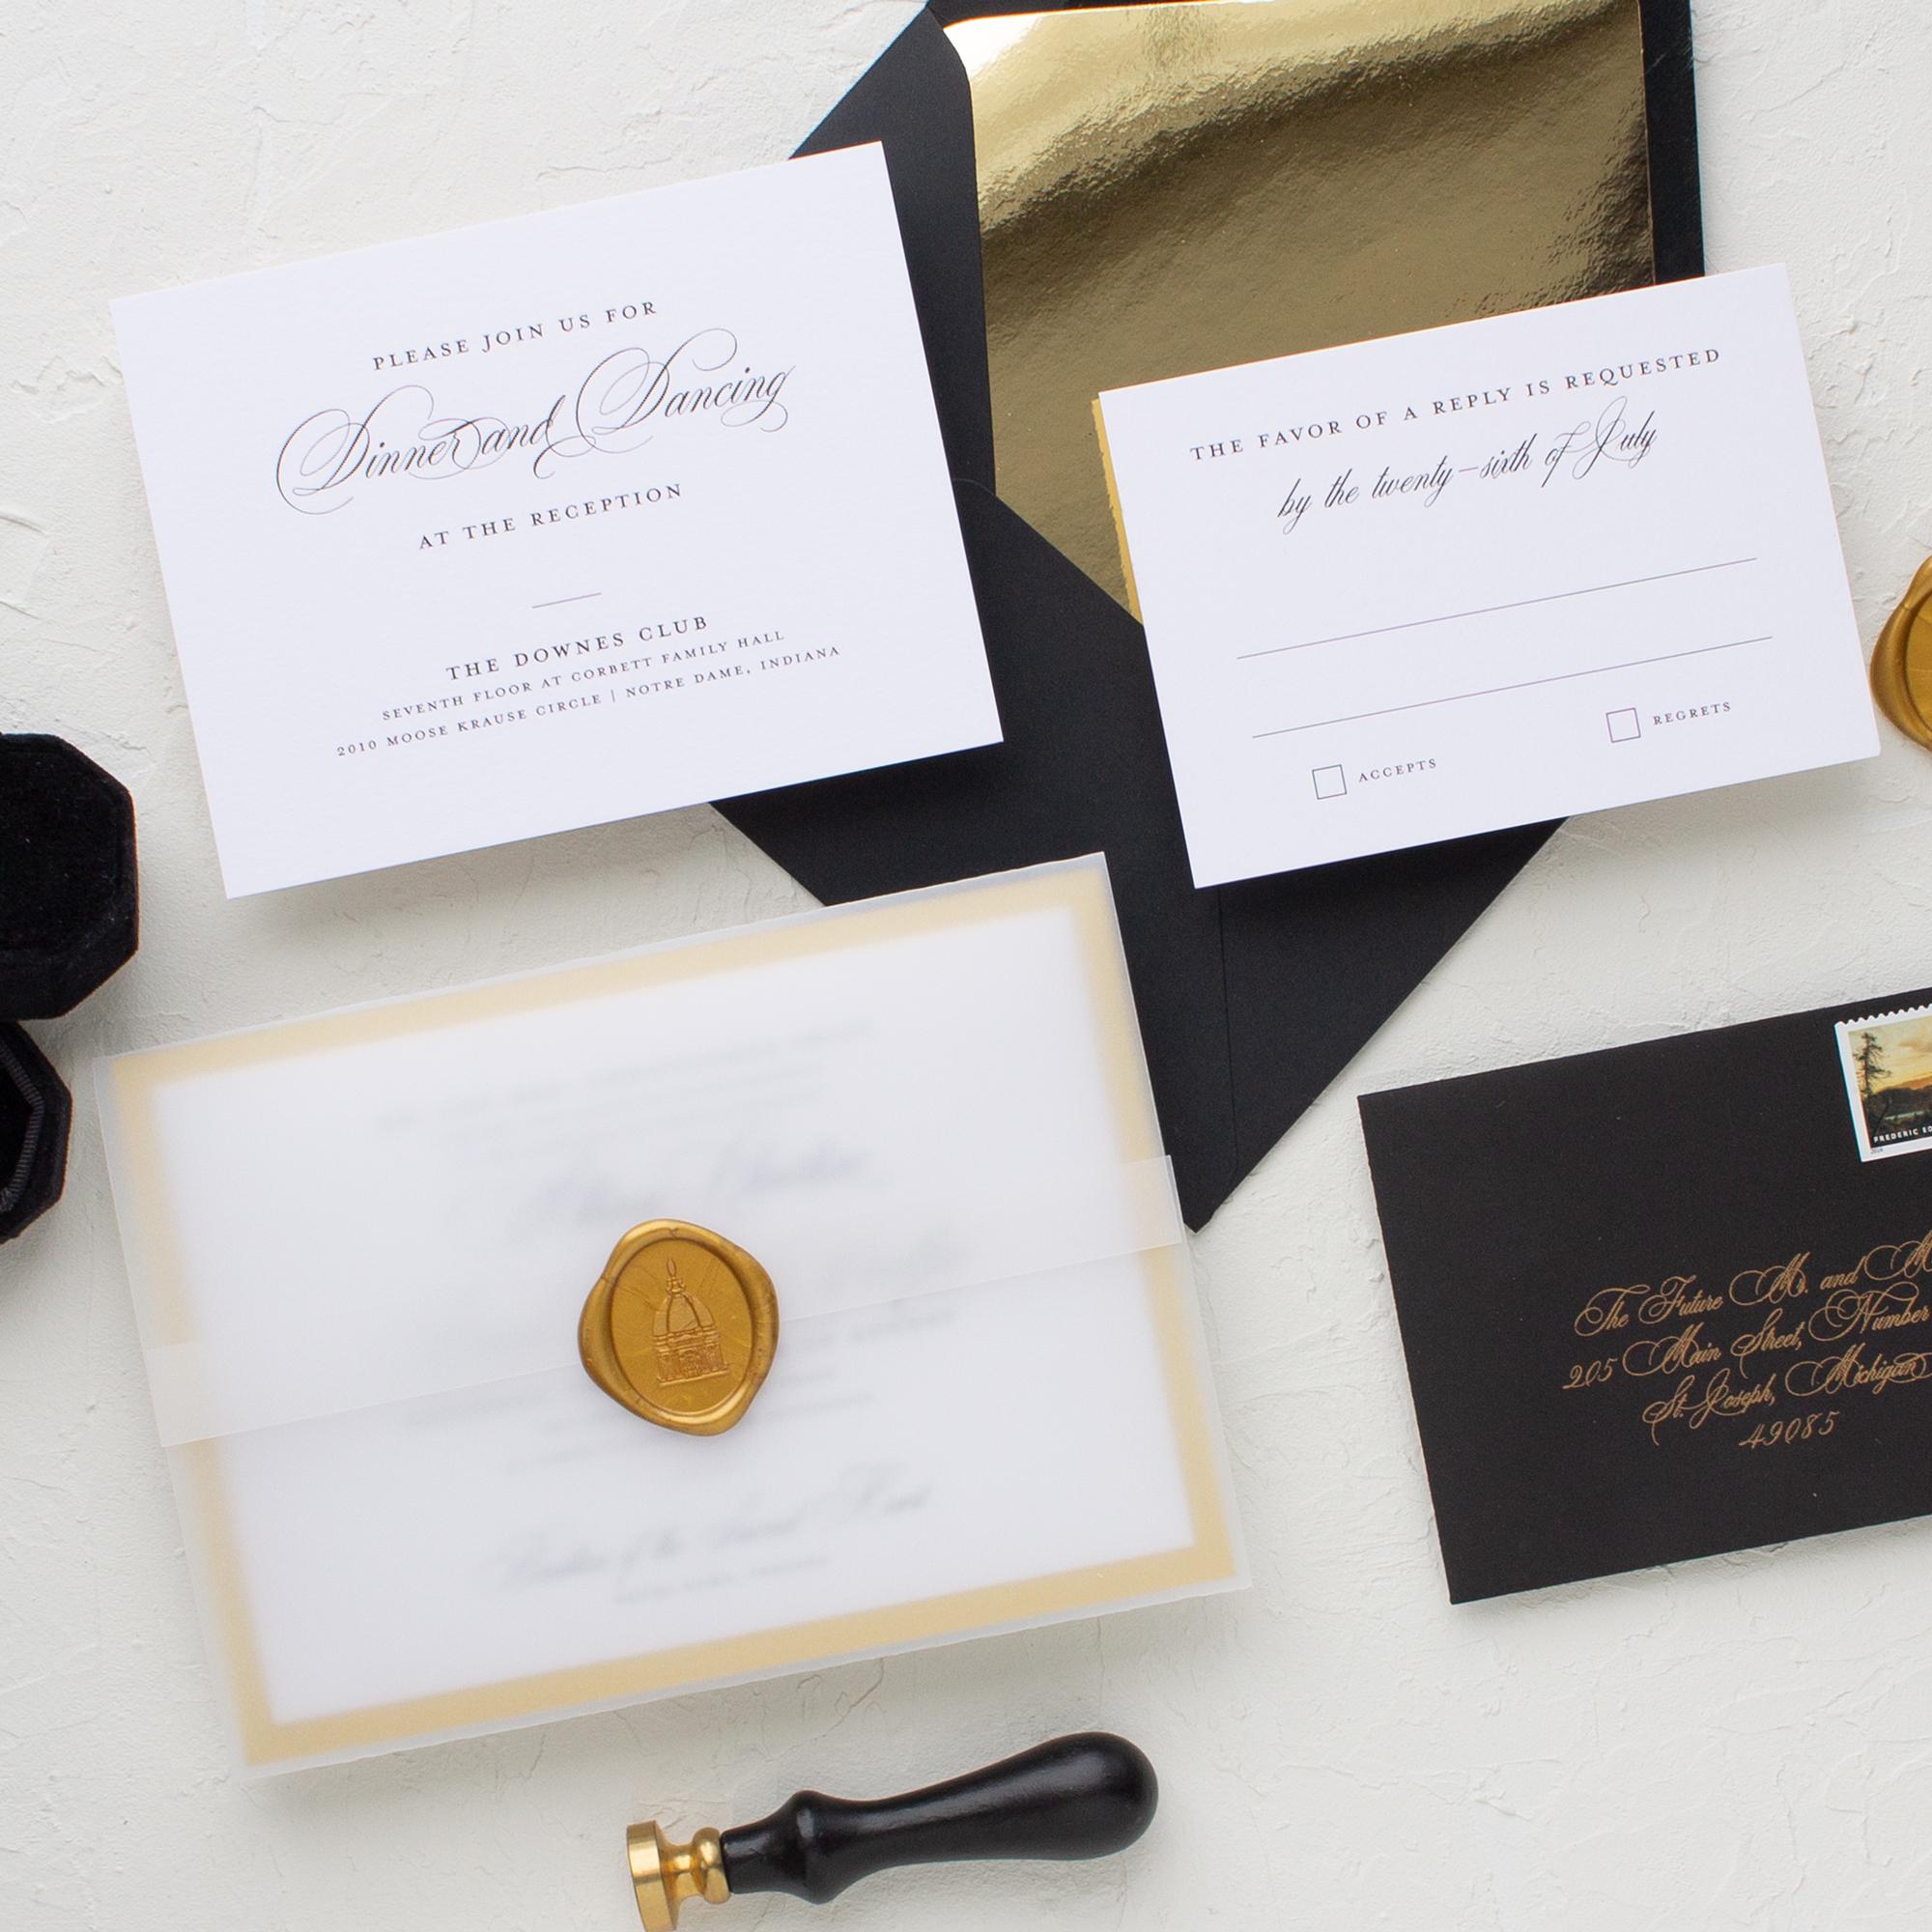 notre dame golden dome wedding invitation